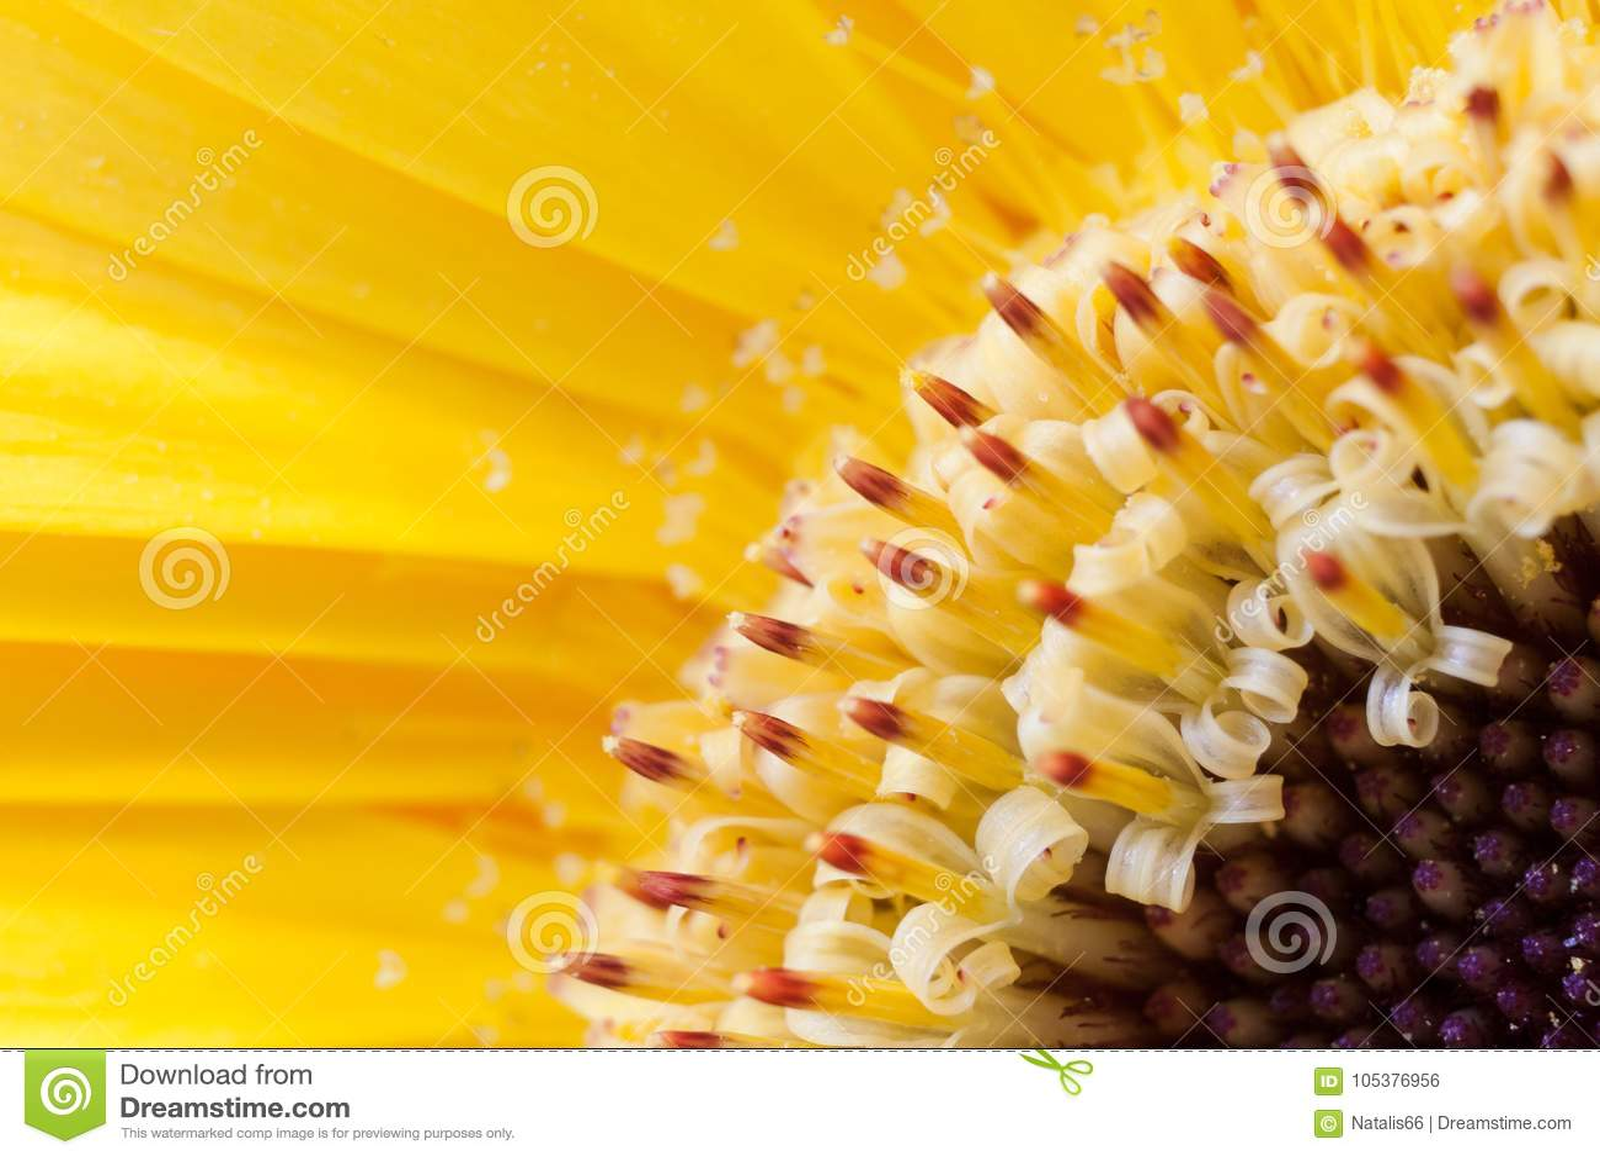 Fundo floral borrado diagonal Pétalas e estames amarelos dos gerberas do close-up com pólen